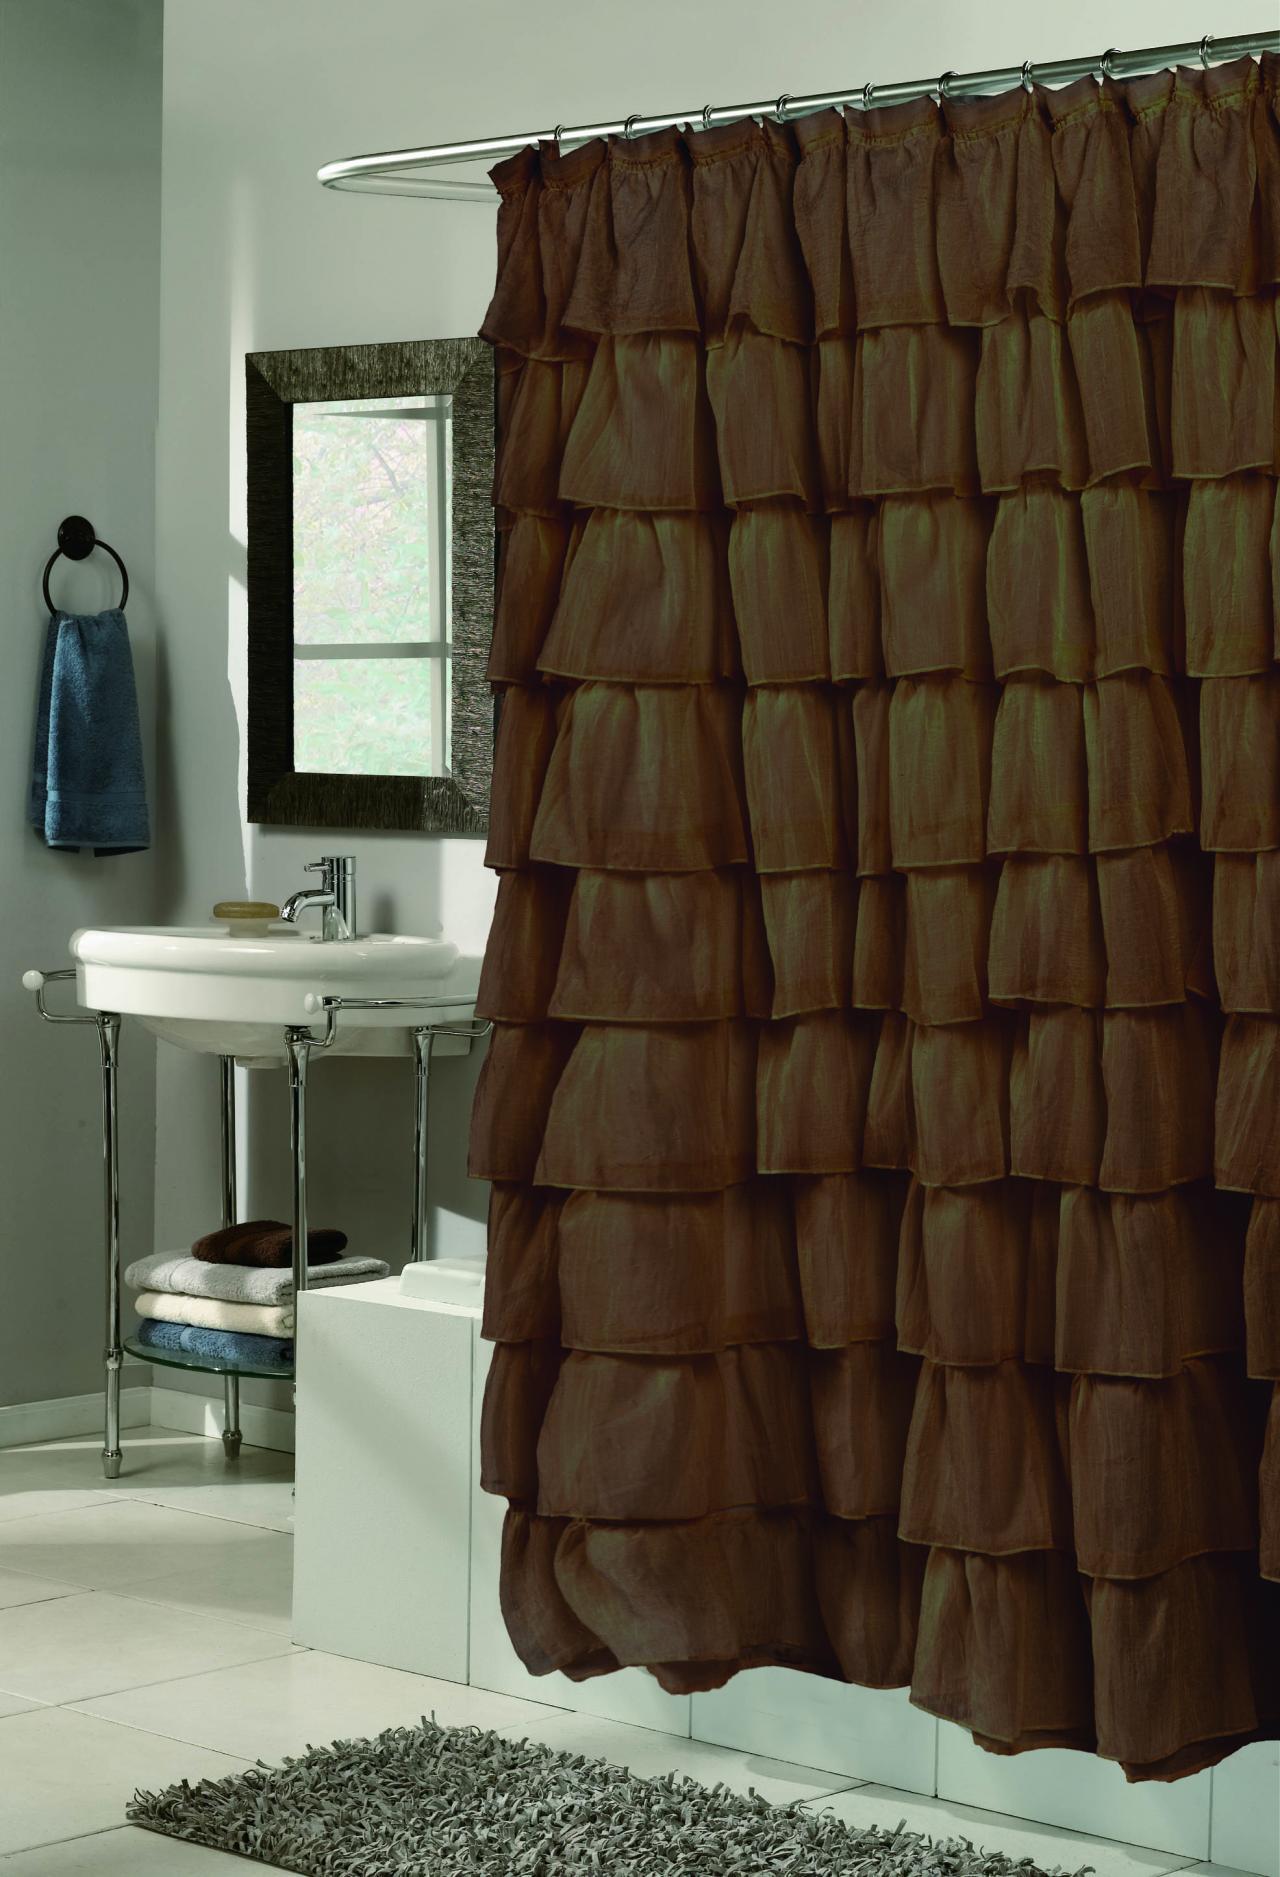 Шторки для ванной Шторка для ванной 178x183 Carnation Home Fashions Carmen коричневая elitnaya-shtorka-dlya-vannoy-carmen-korichnevaya-ot-carnation-ssha-kitay.jpg